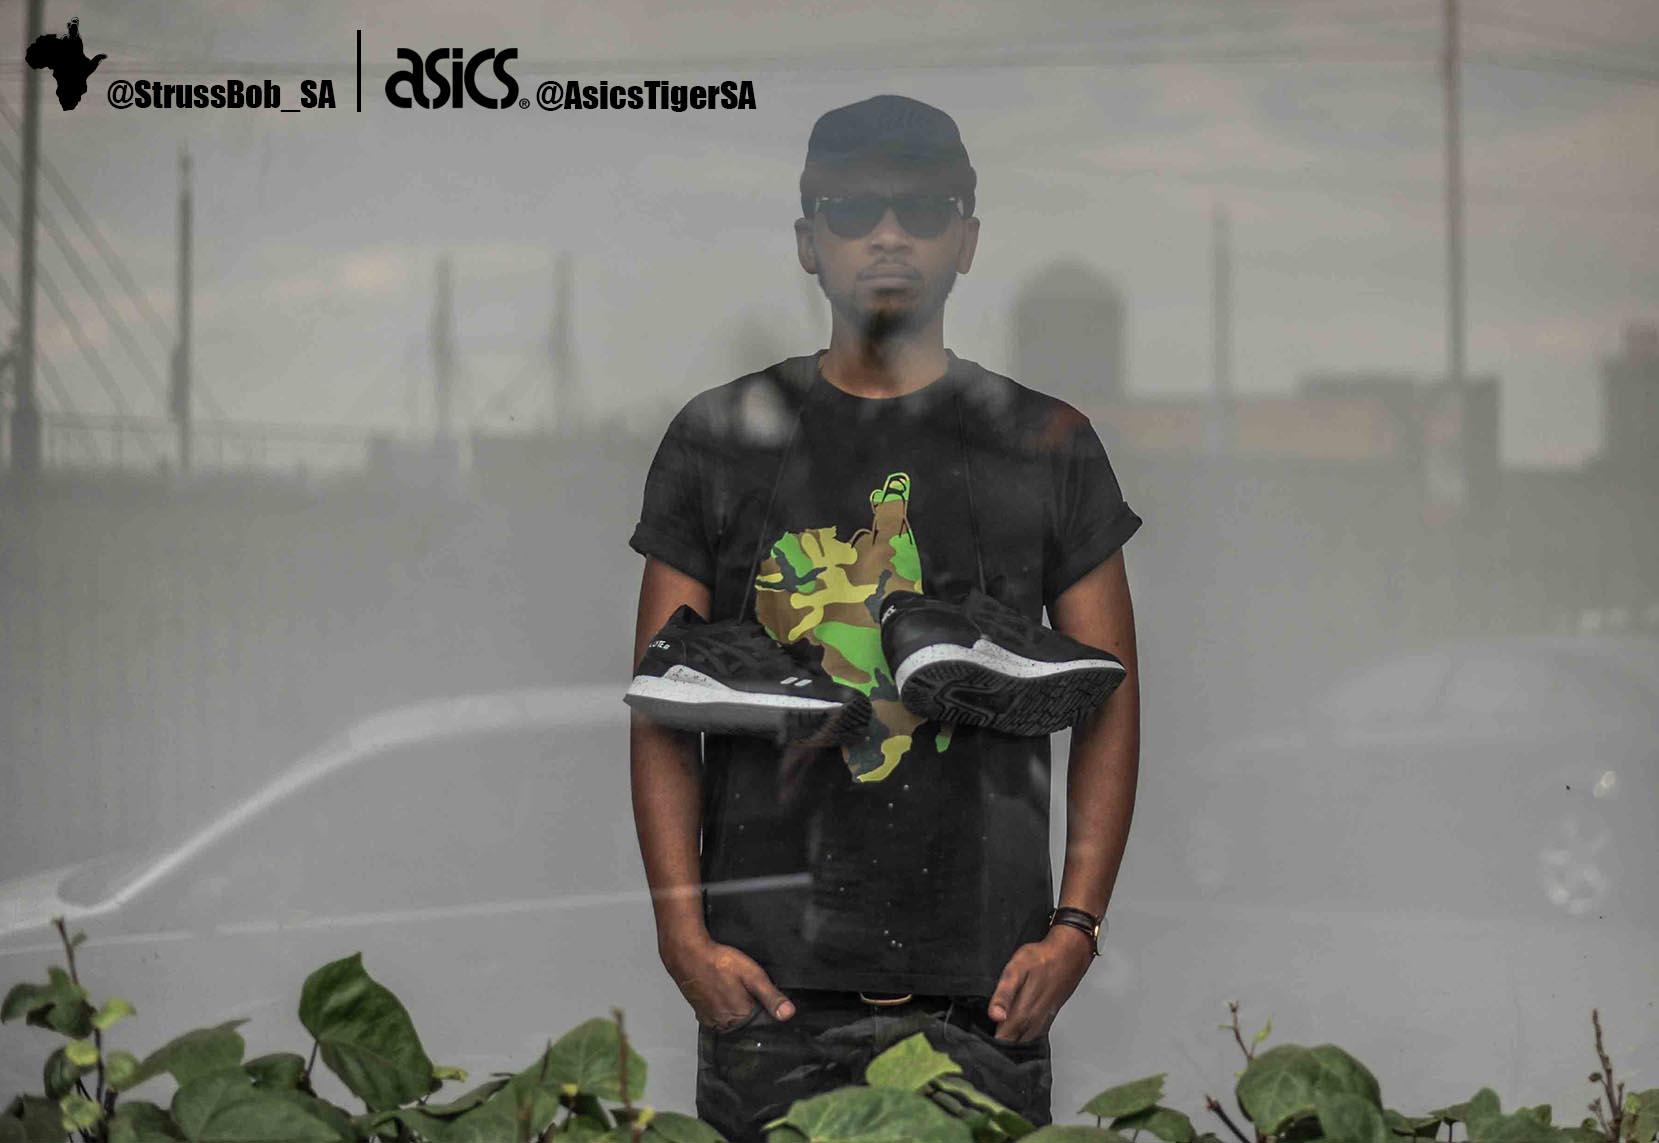 asics x strussbob shoot 5  black